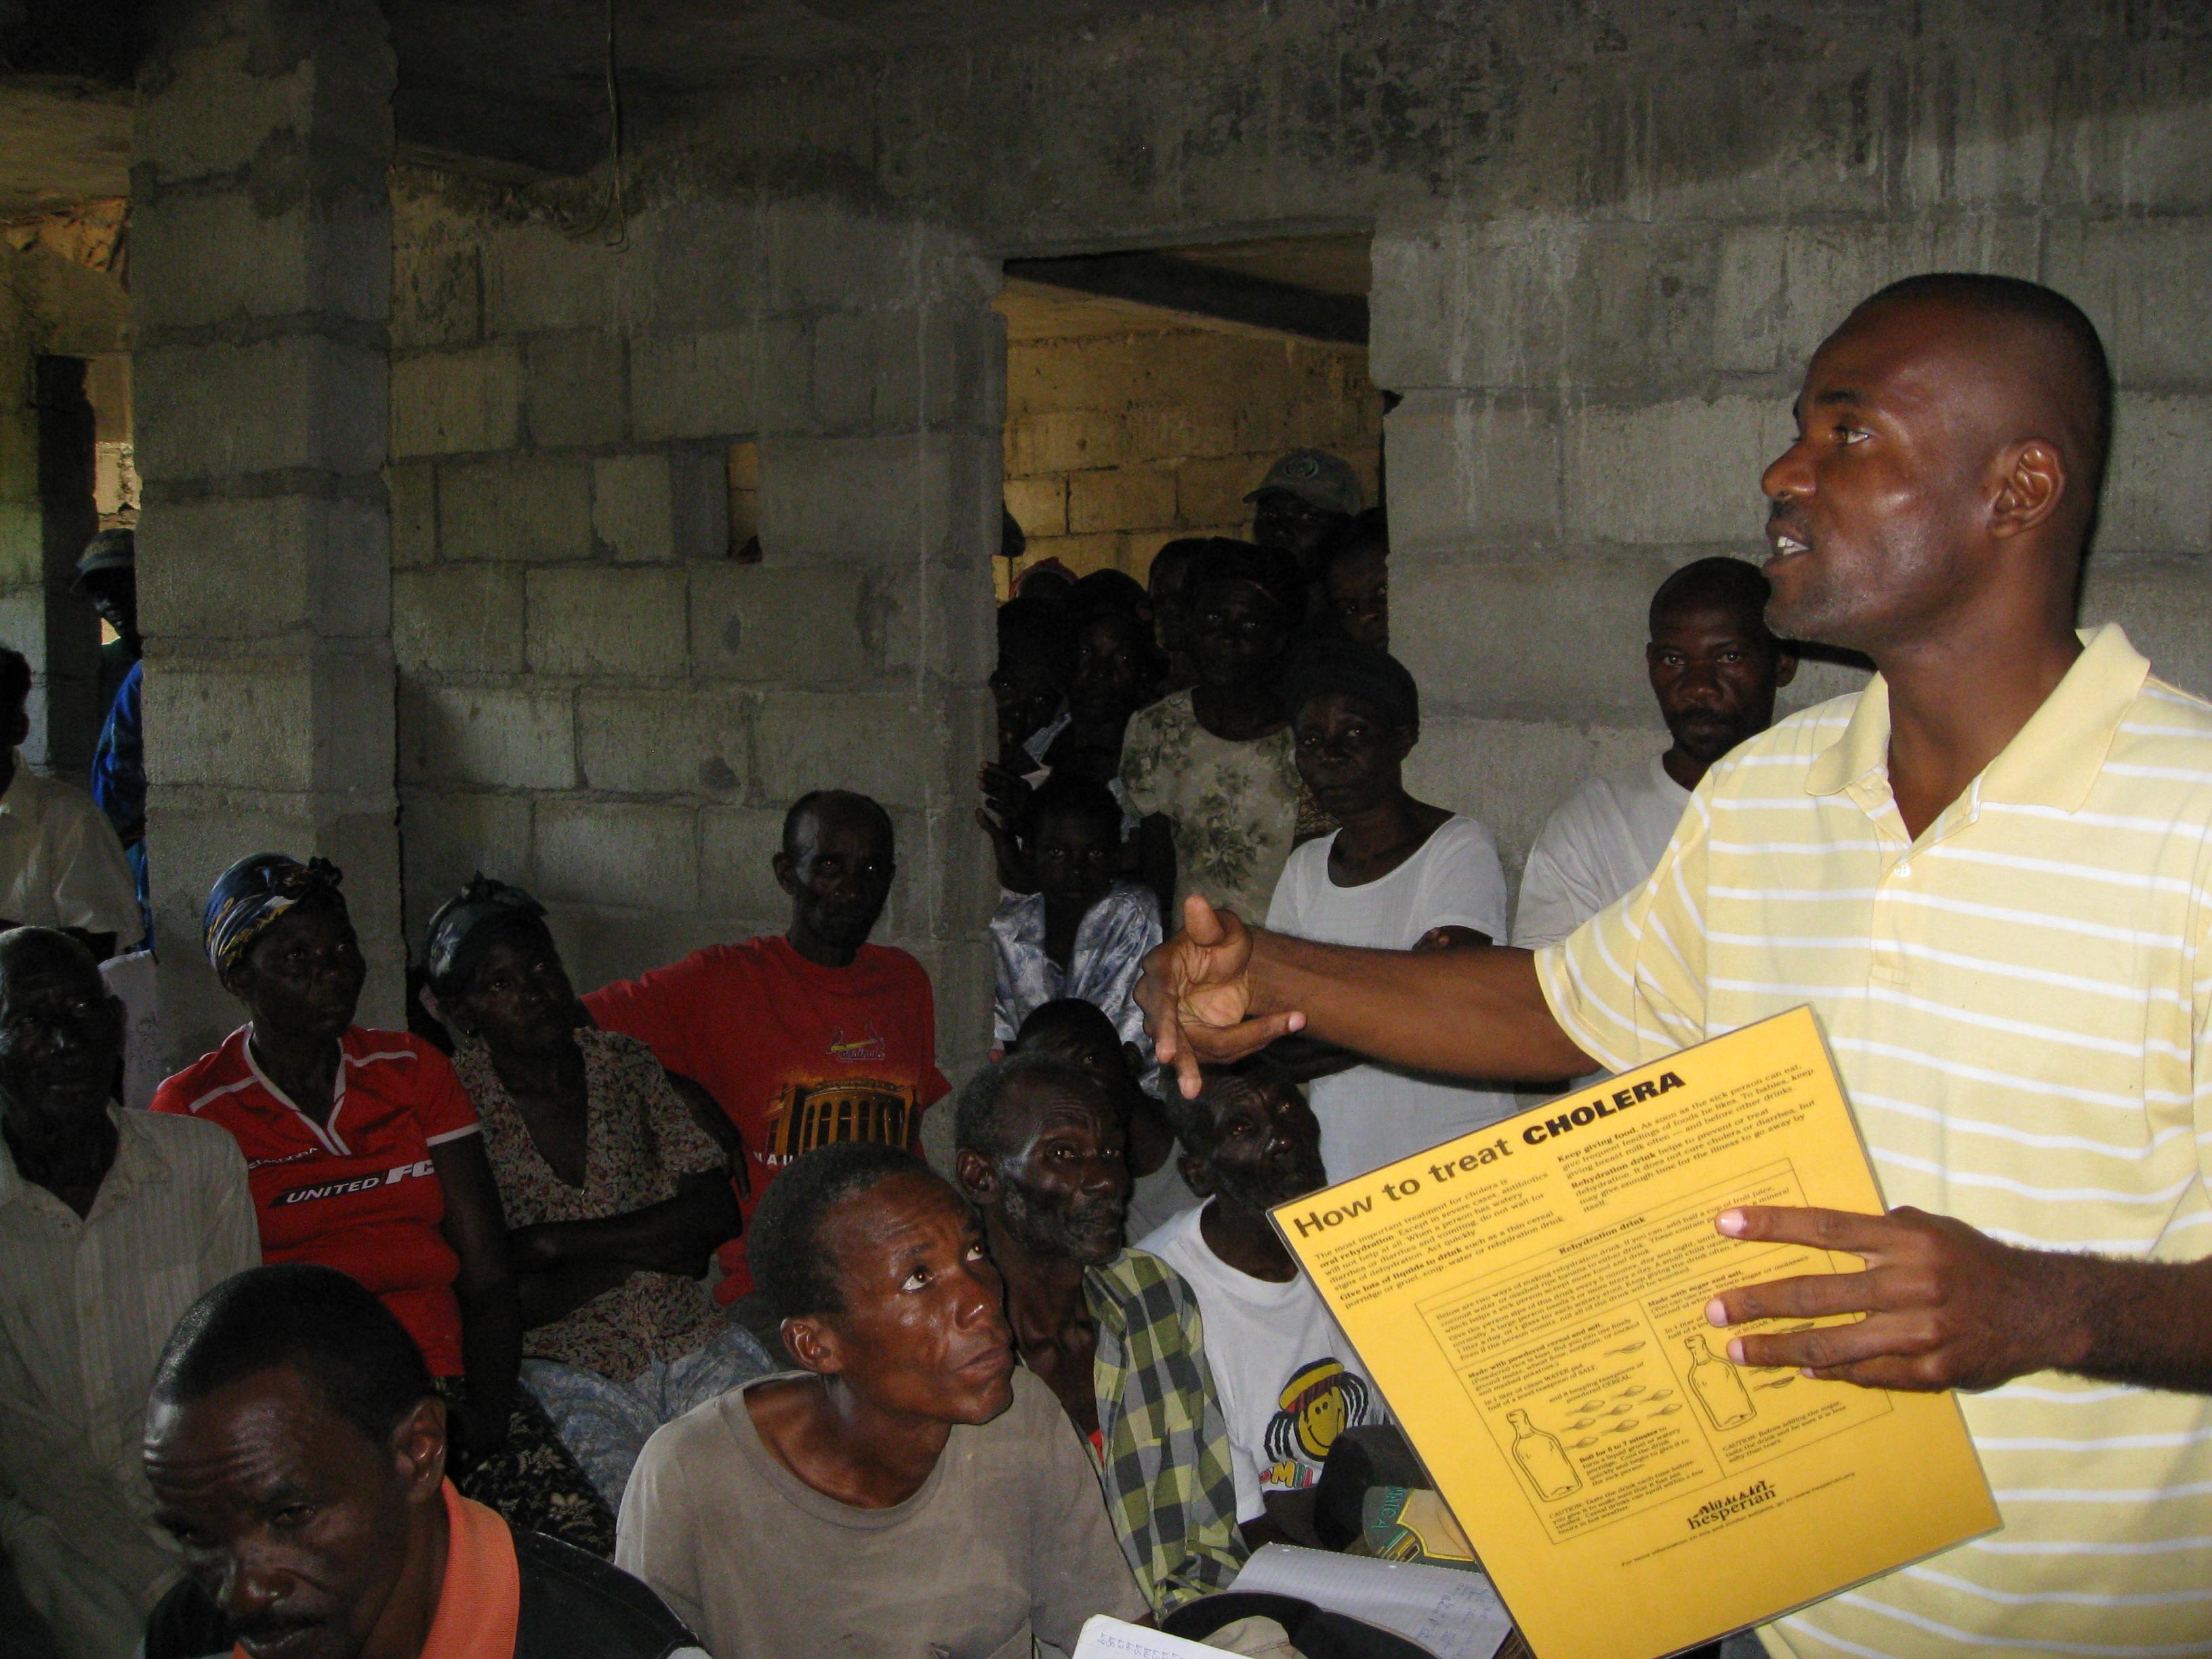 BIF representative Thelusma Renel leads cholera workshop